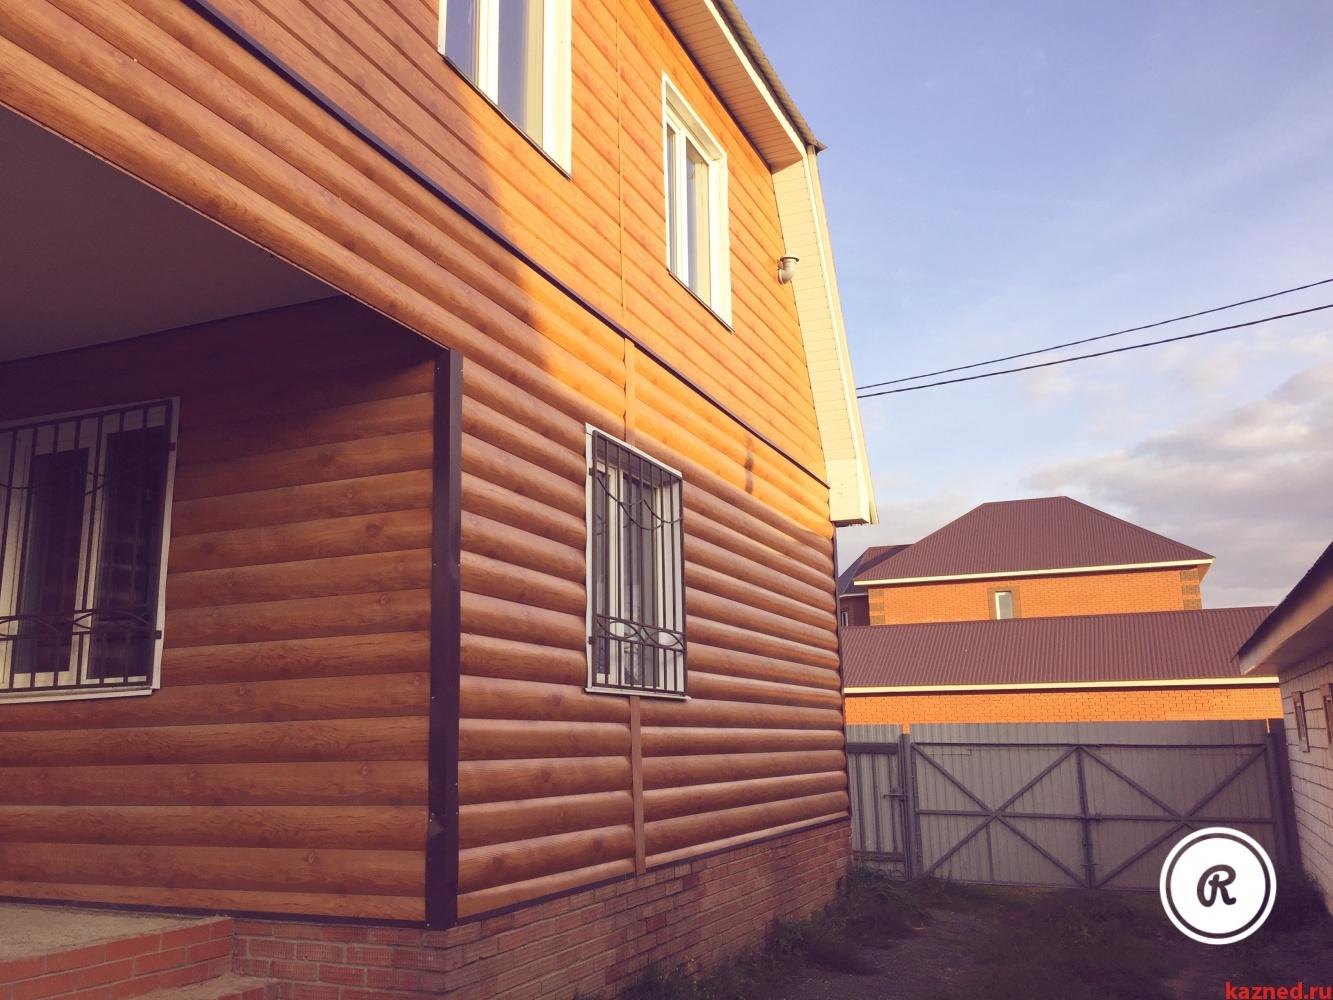 Продажа  дома константиновка ул казанская, 160 м²  (миниатюра №3)